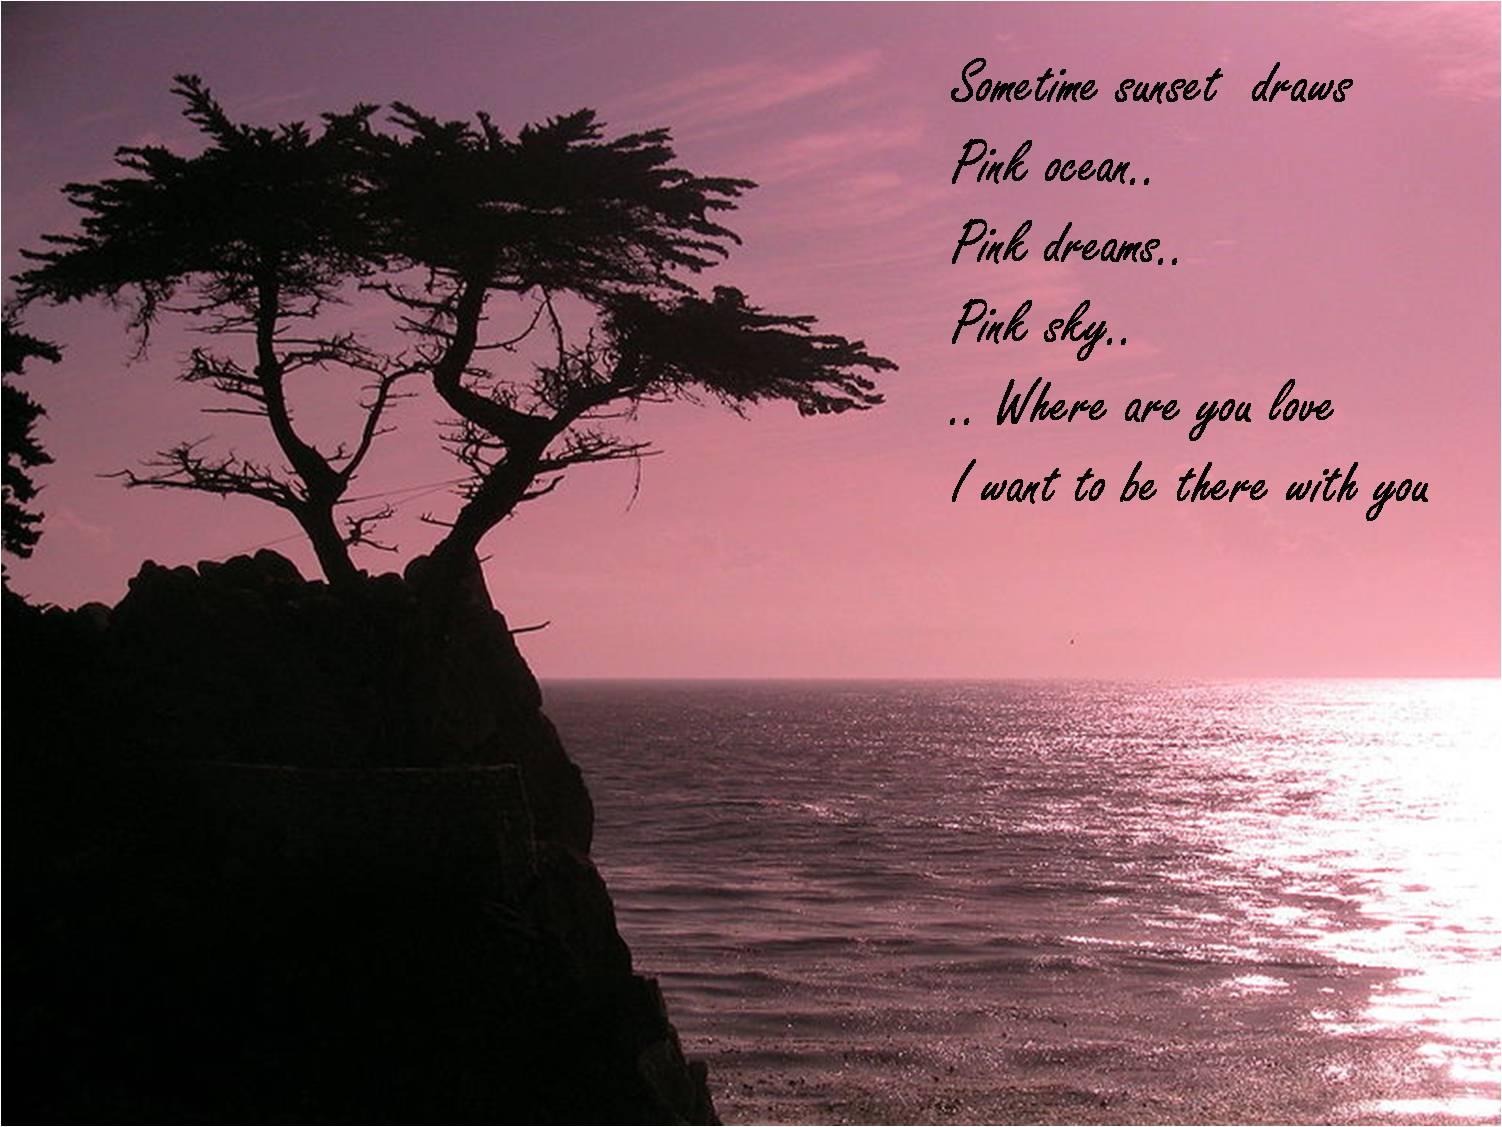 Romantic Love Words For Him 10 Free Hd Wallpaper - Hdlovewall.com